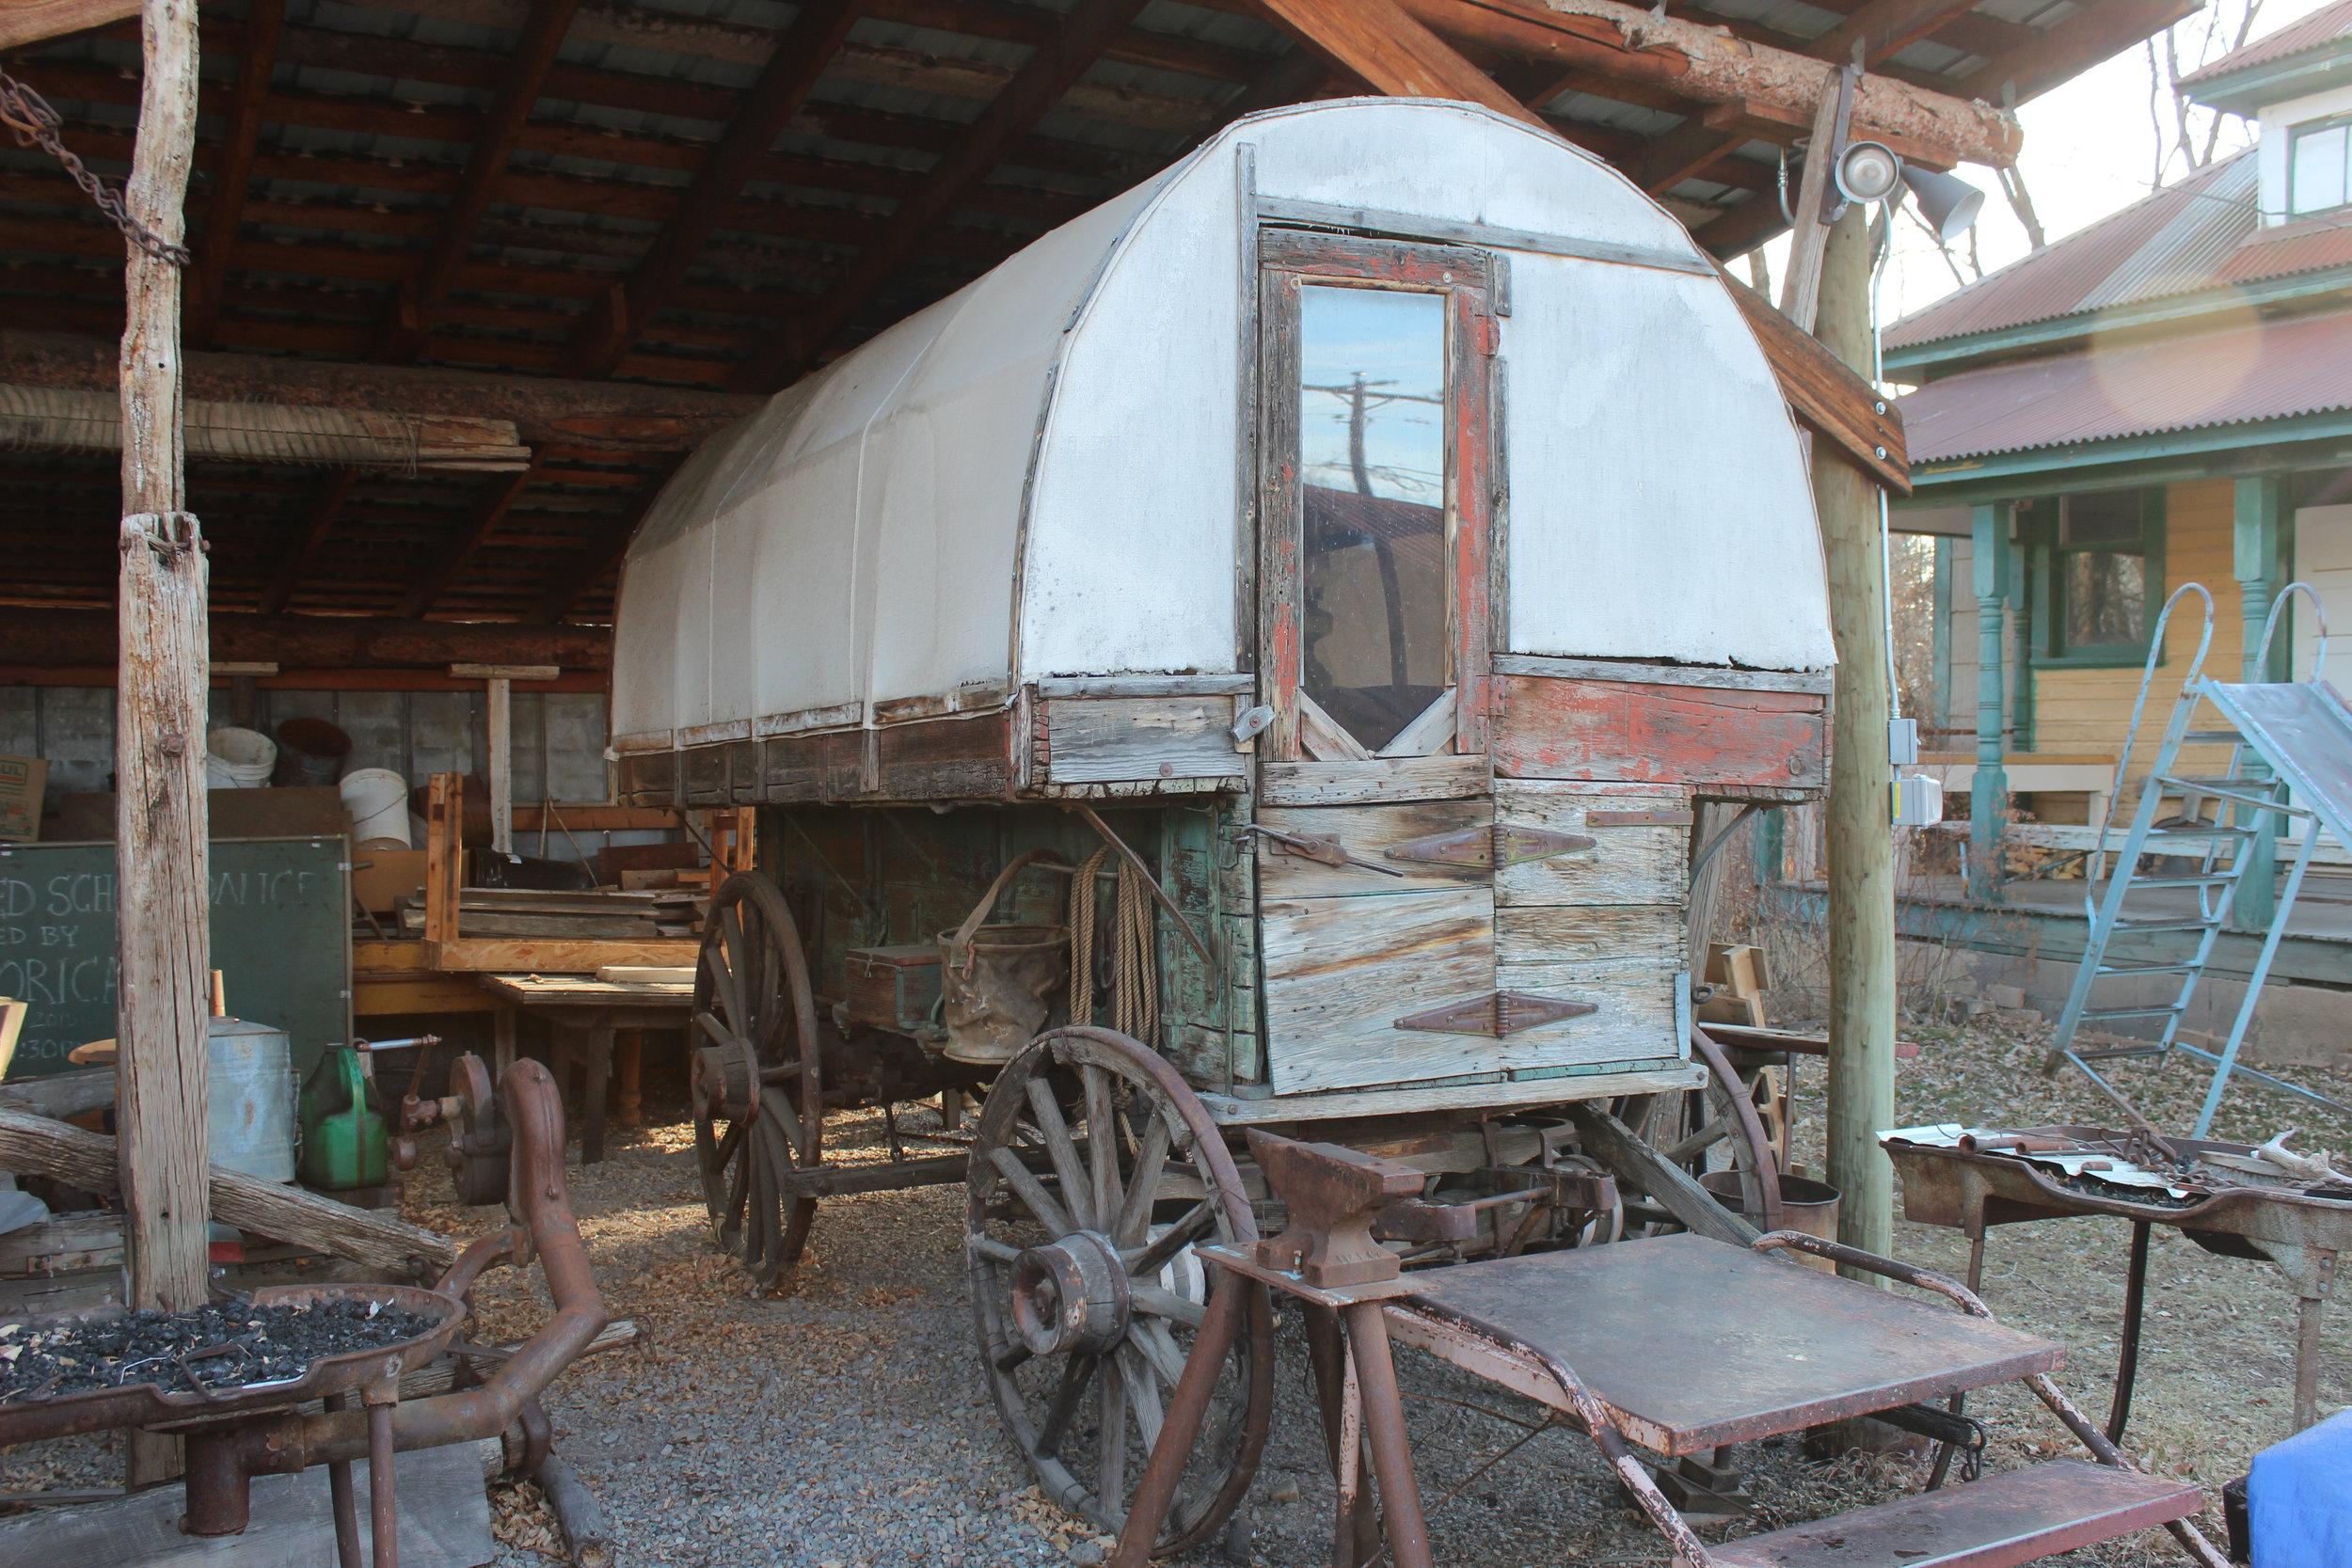 Sheepherder's wagon.